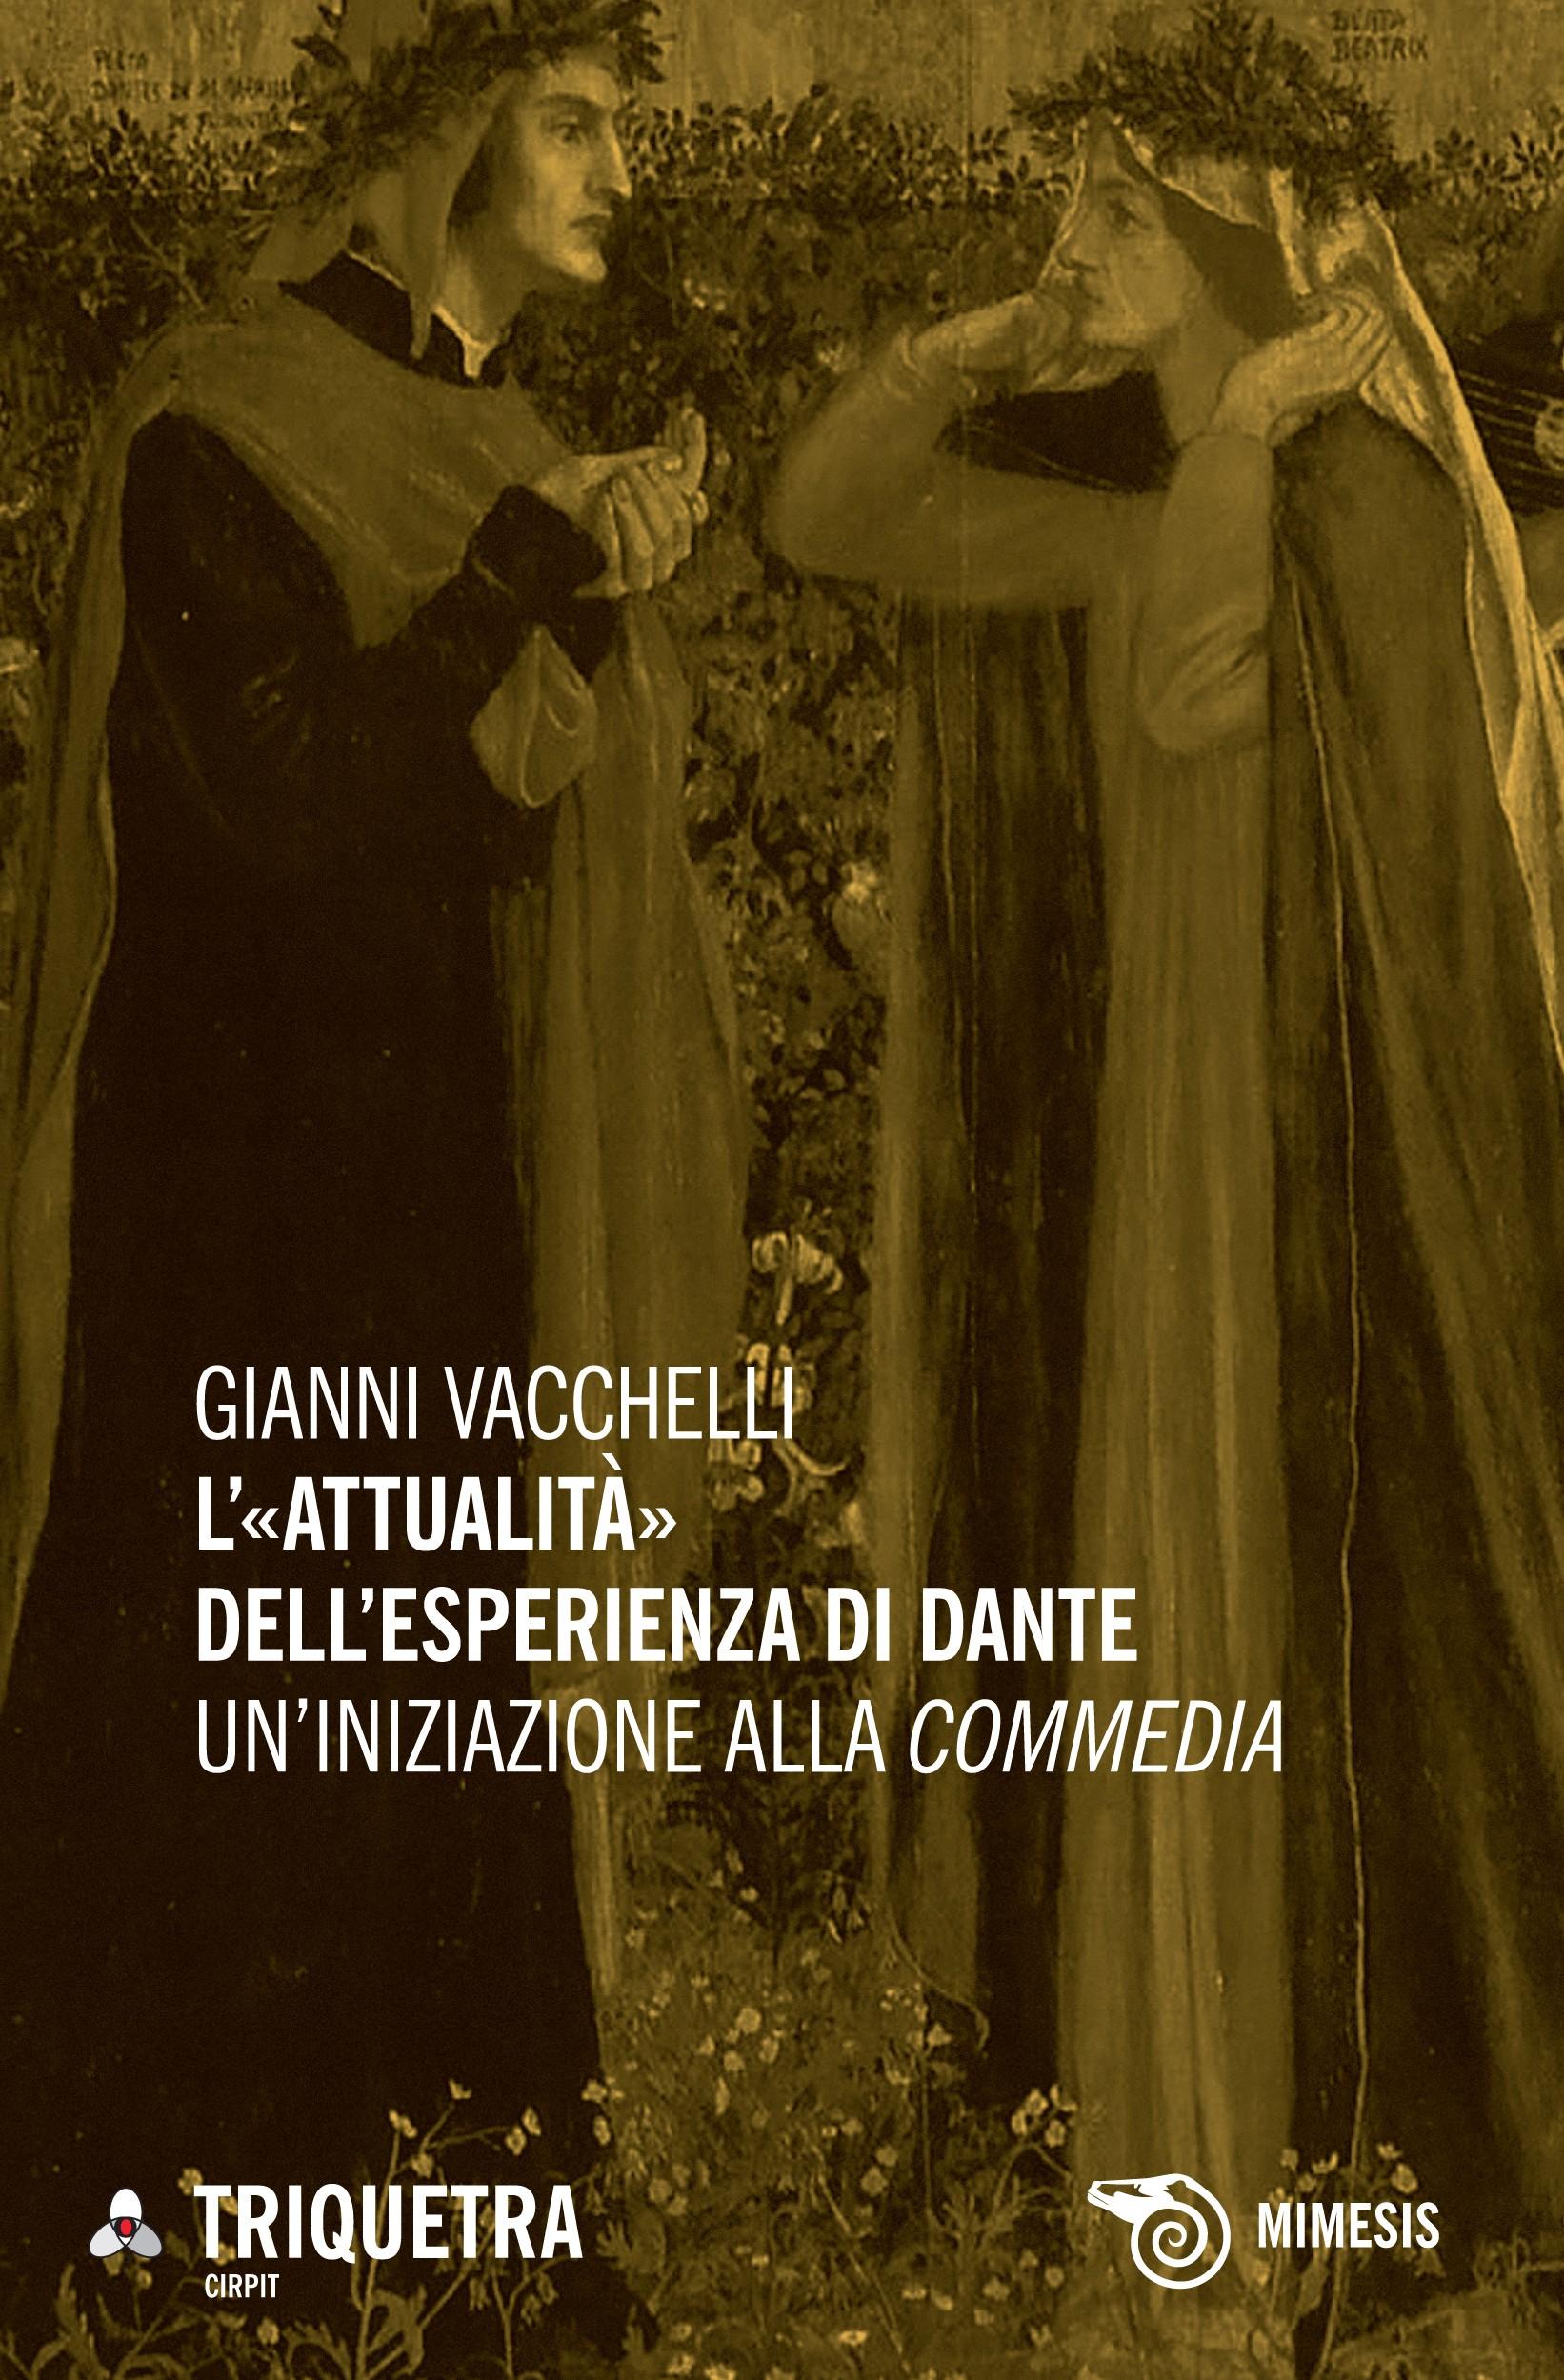 Gianni Vacchelli